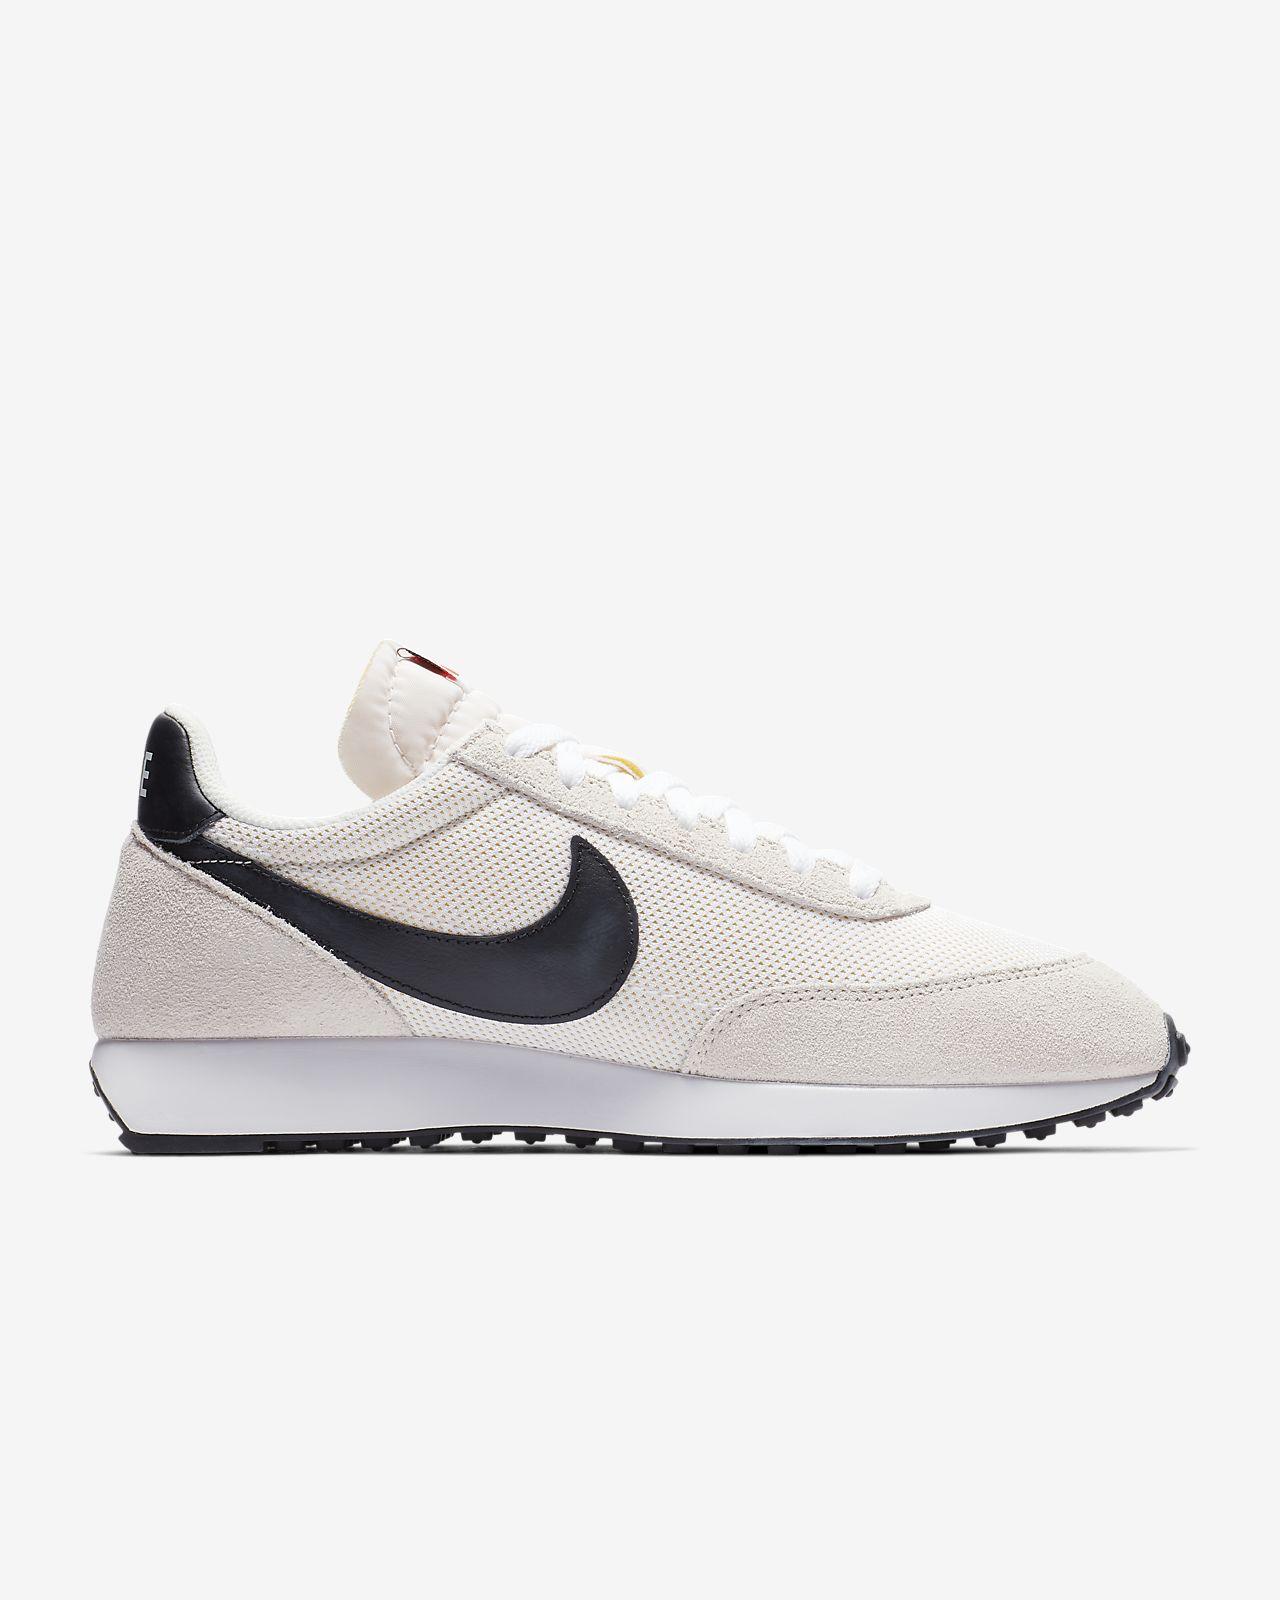 Nike AIR TAILWIND 79 OG Review et on feet! Le test vintage